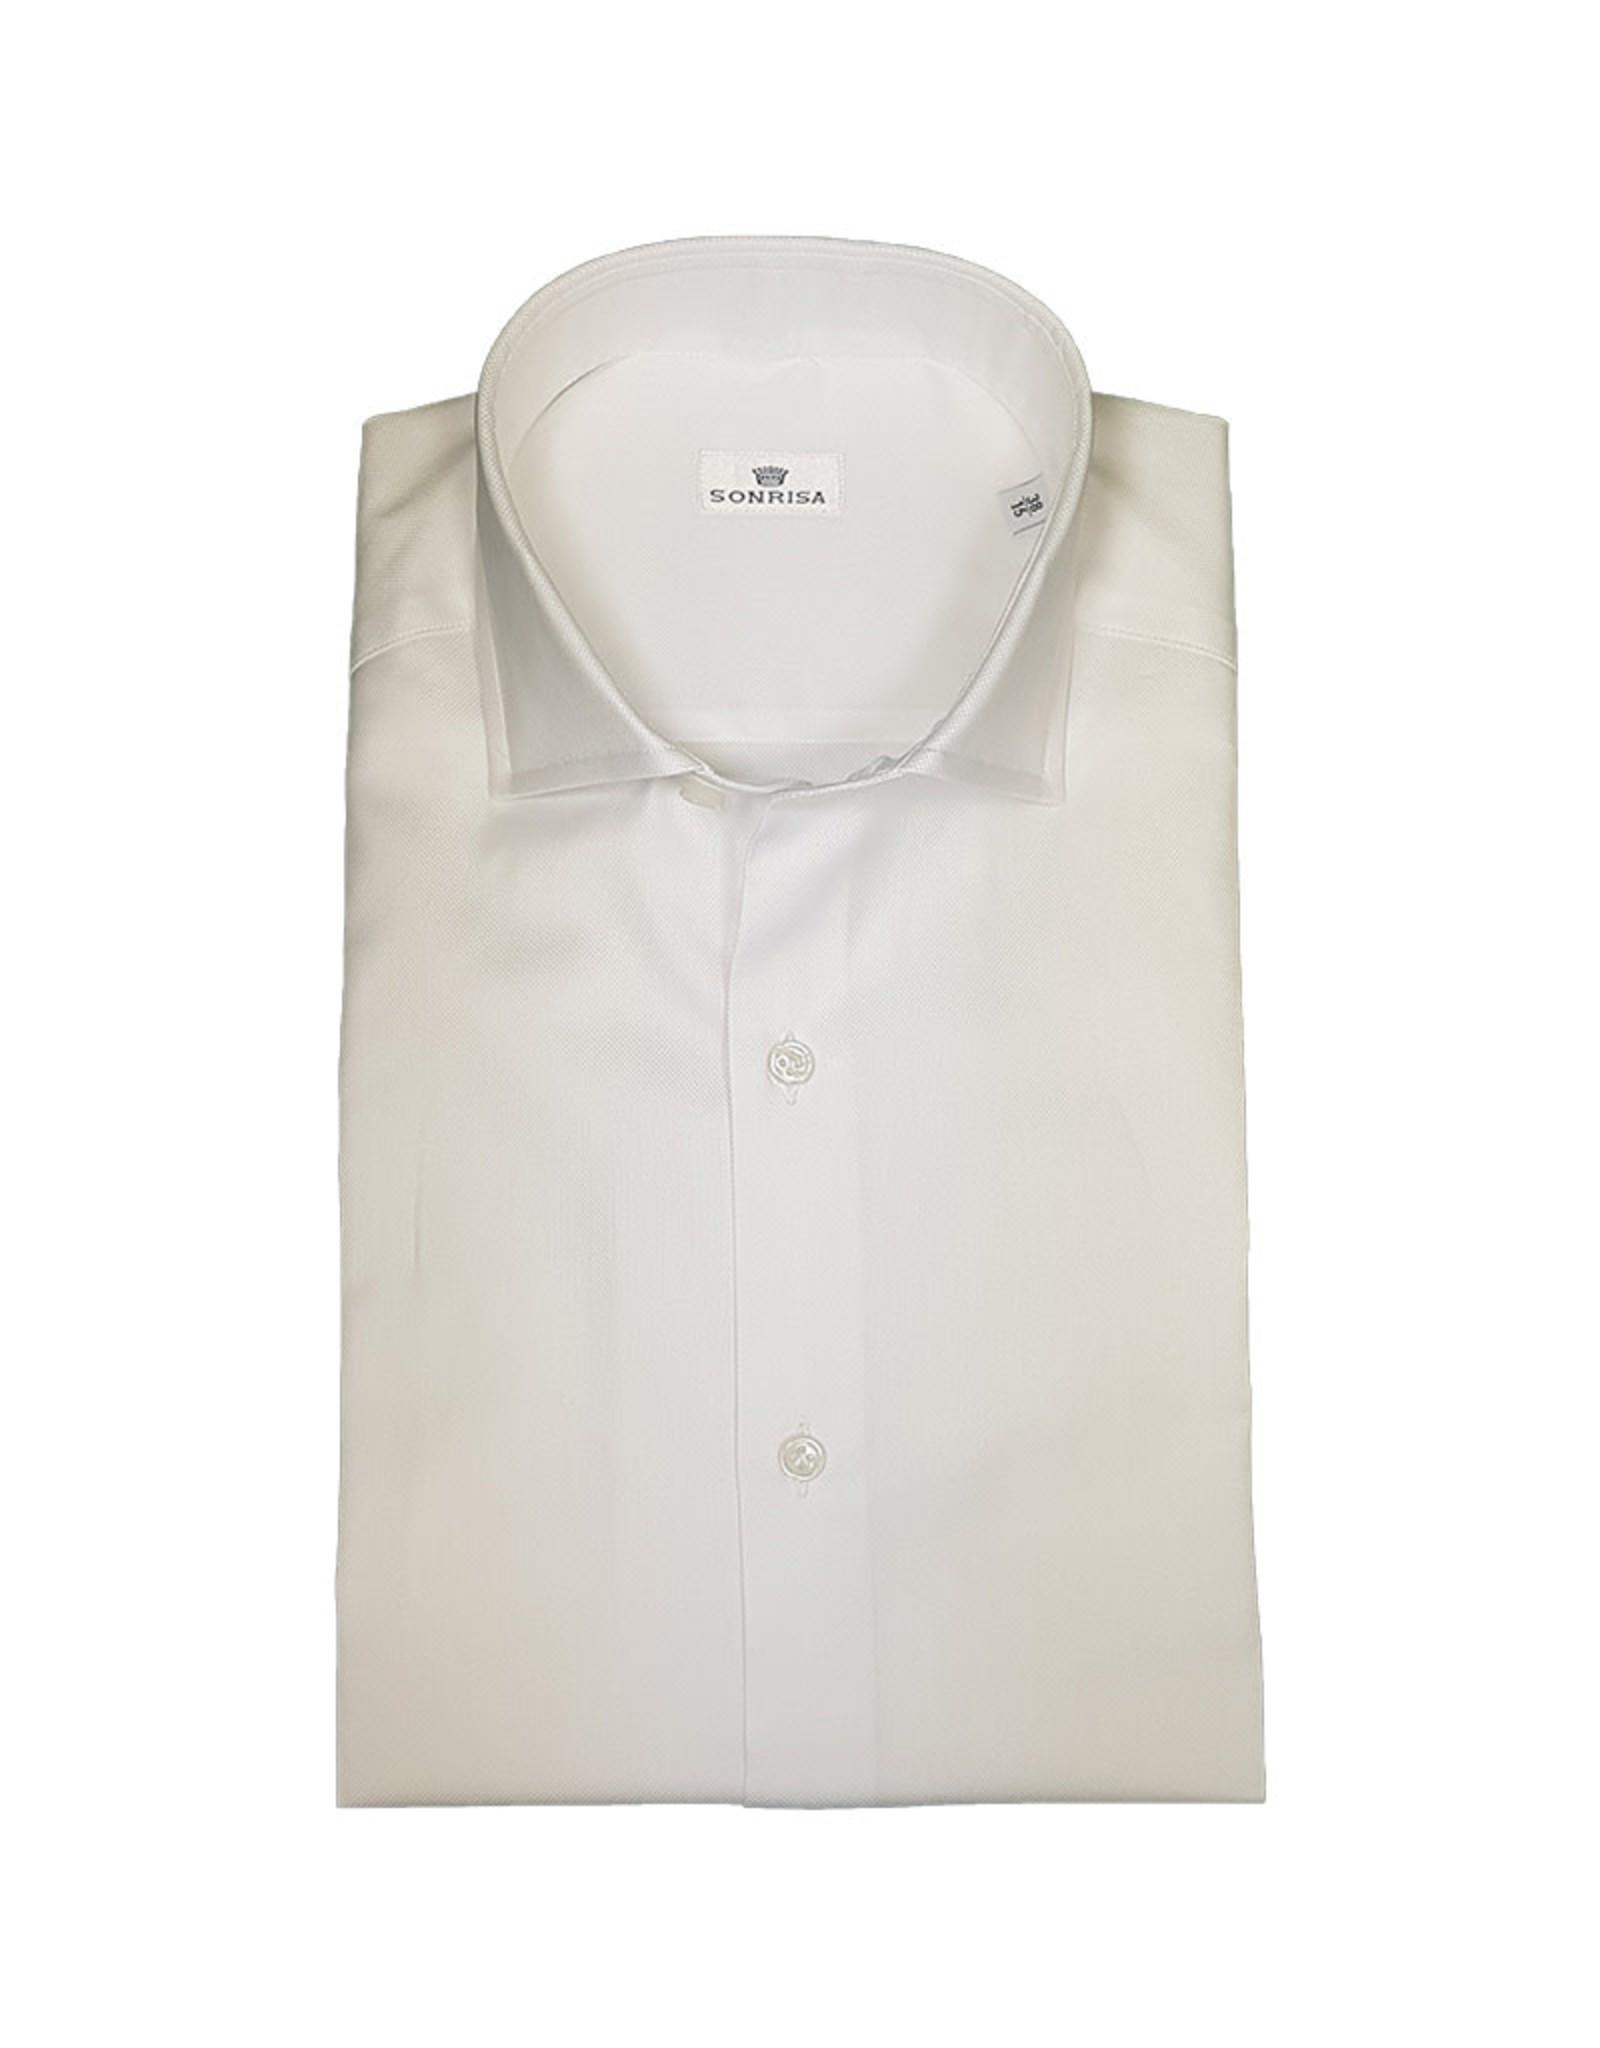 Sonrisa Sonrisa hemd wit Slimline P19 M270/01